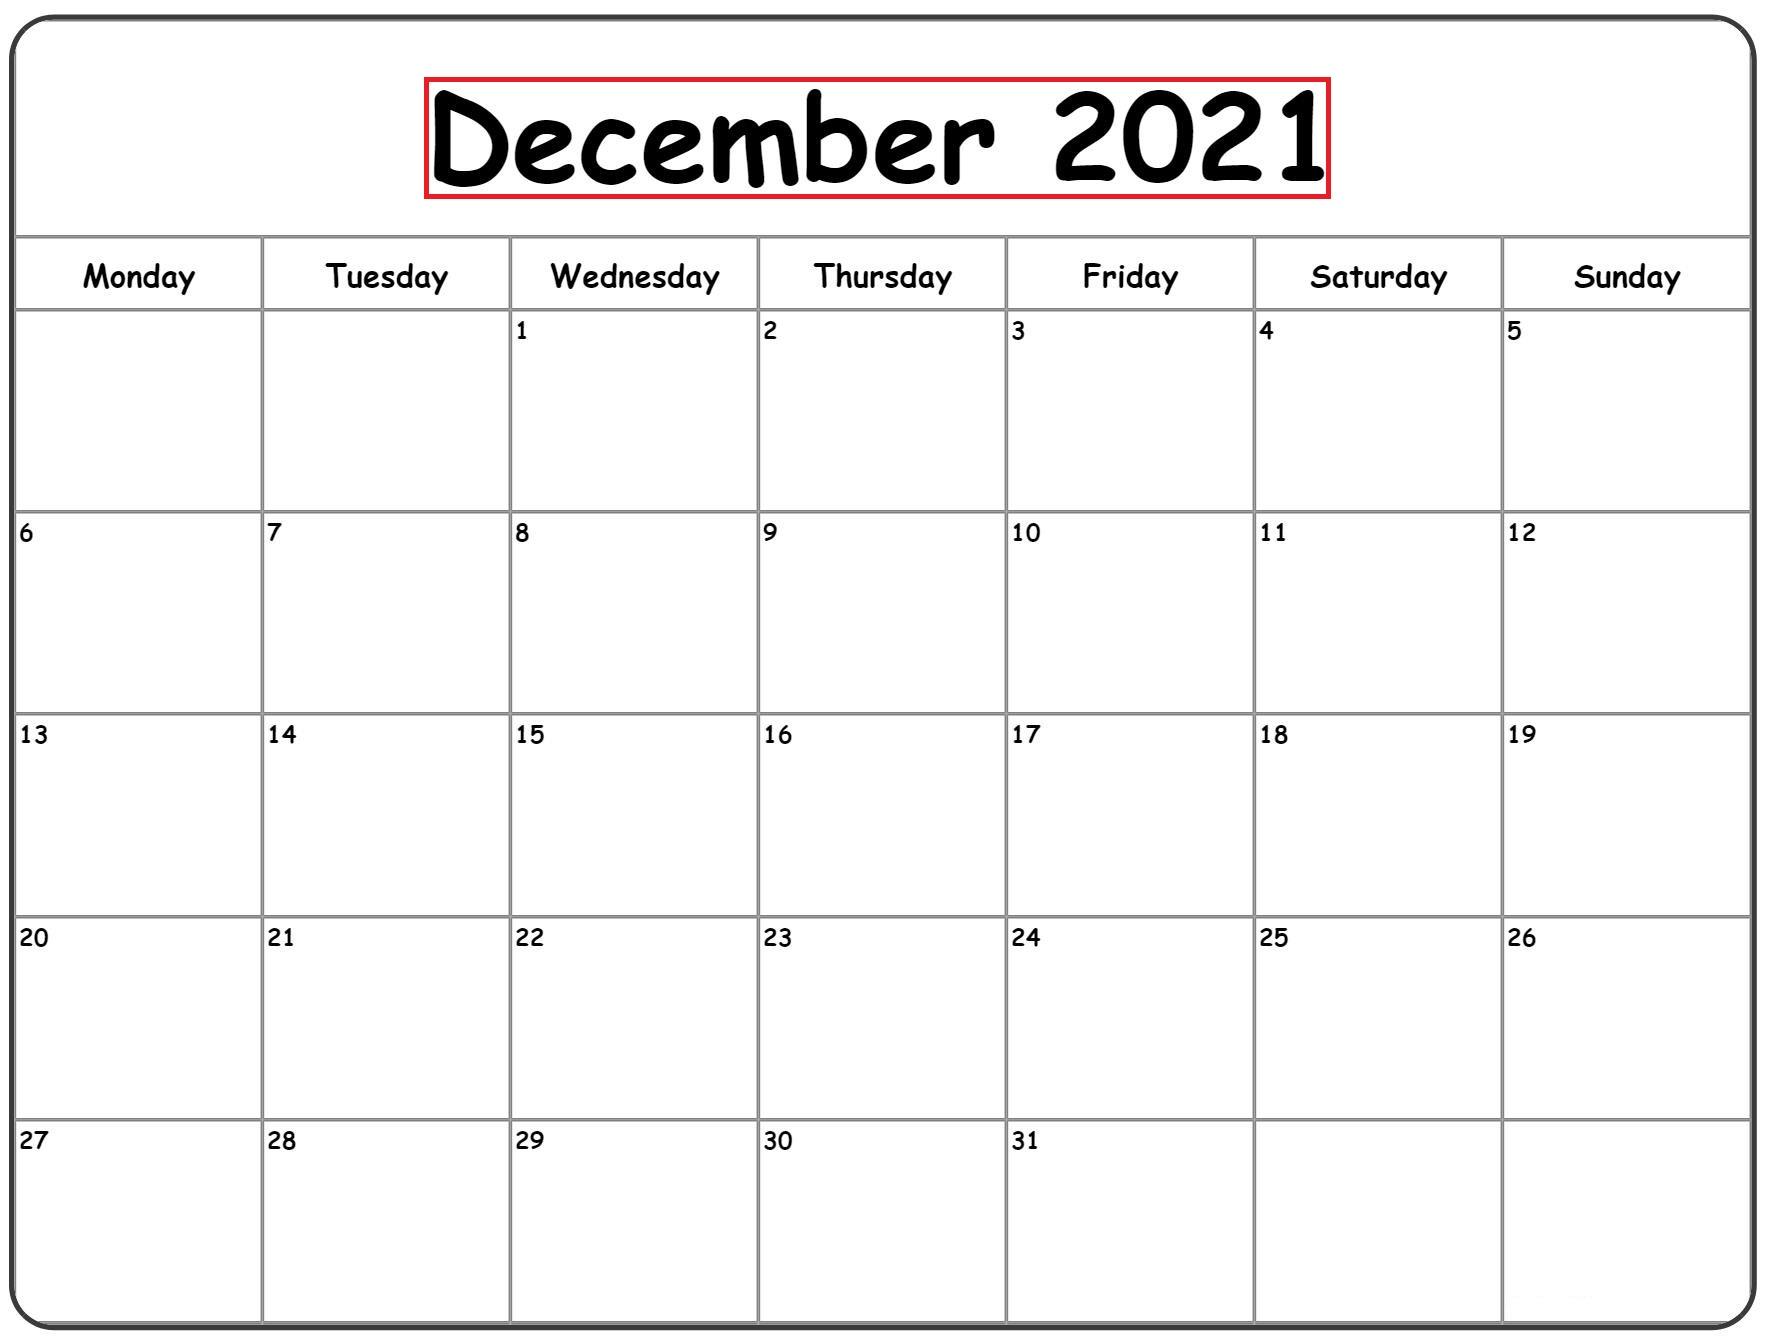 December 2021 Blank Calendar Grid Printable